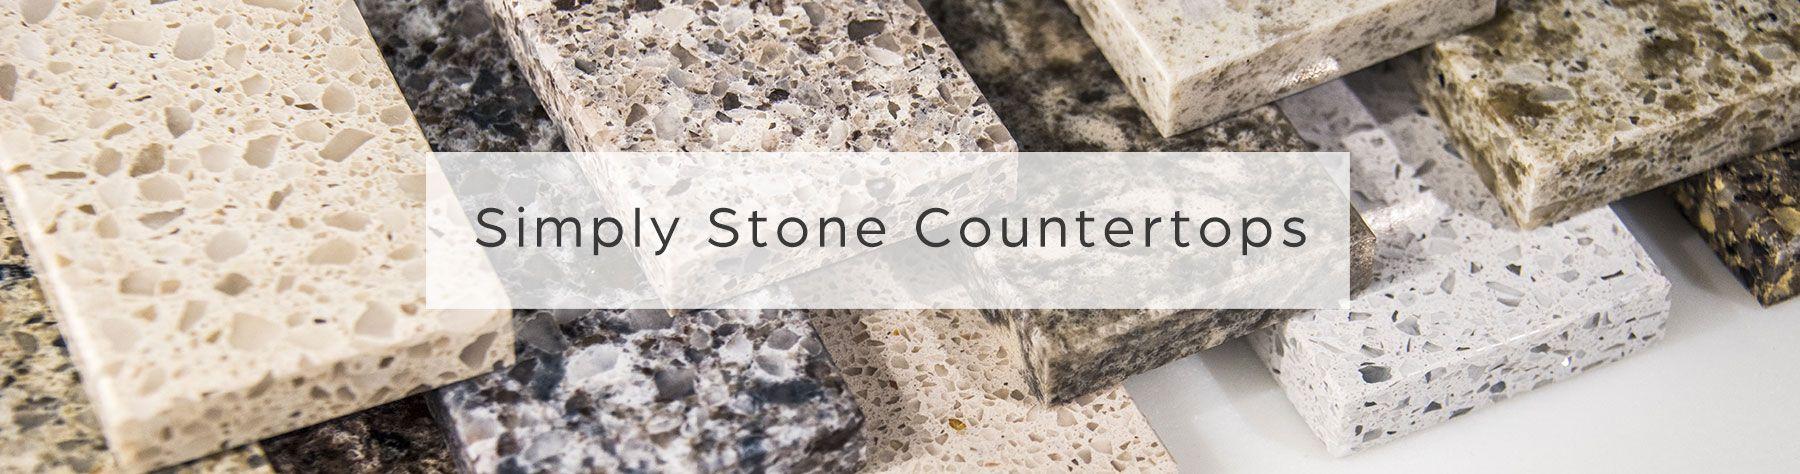 Simply Stone Countertops, Sheridan Wyoming